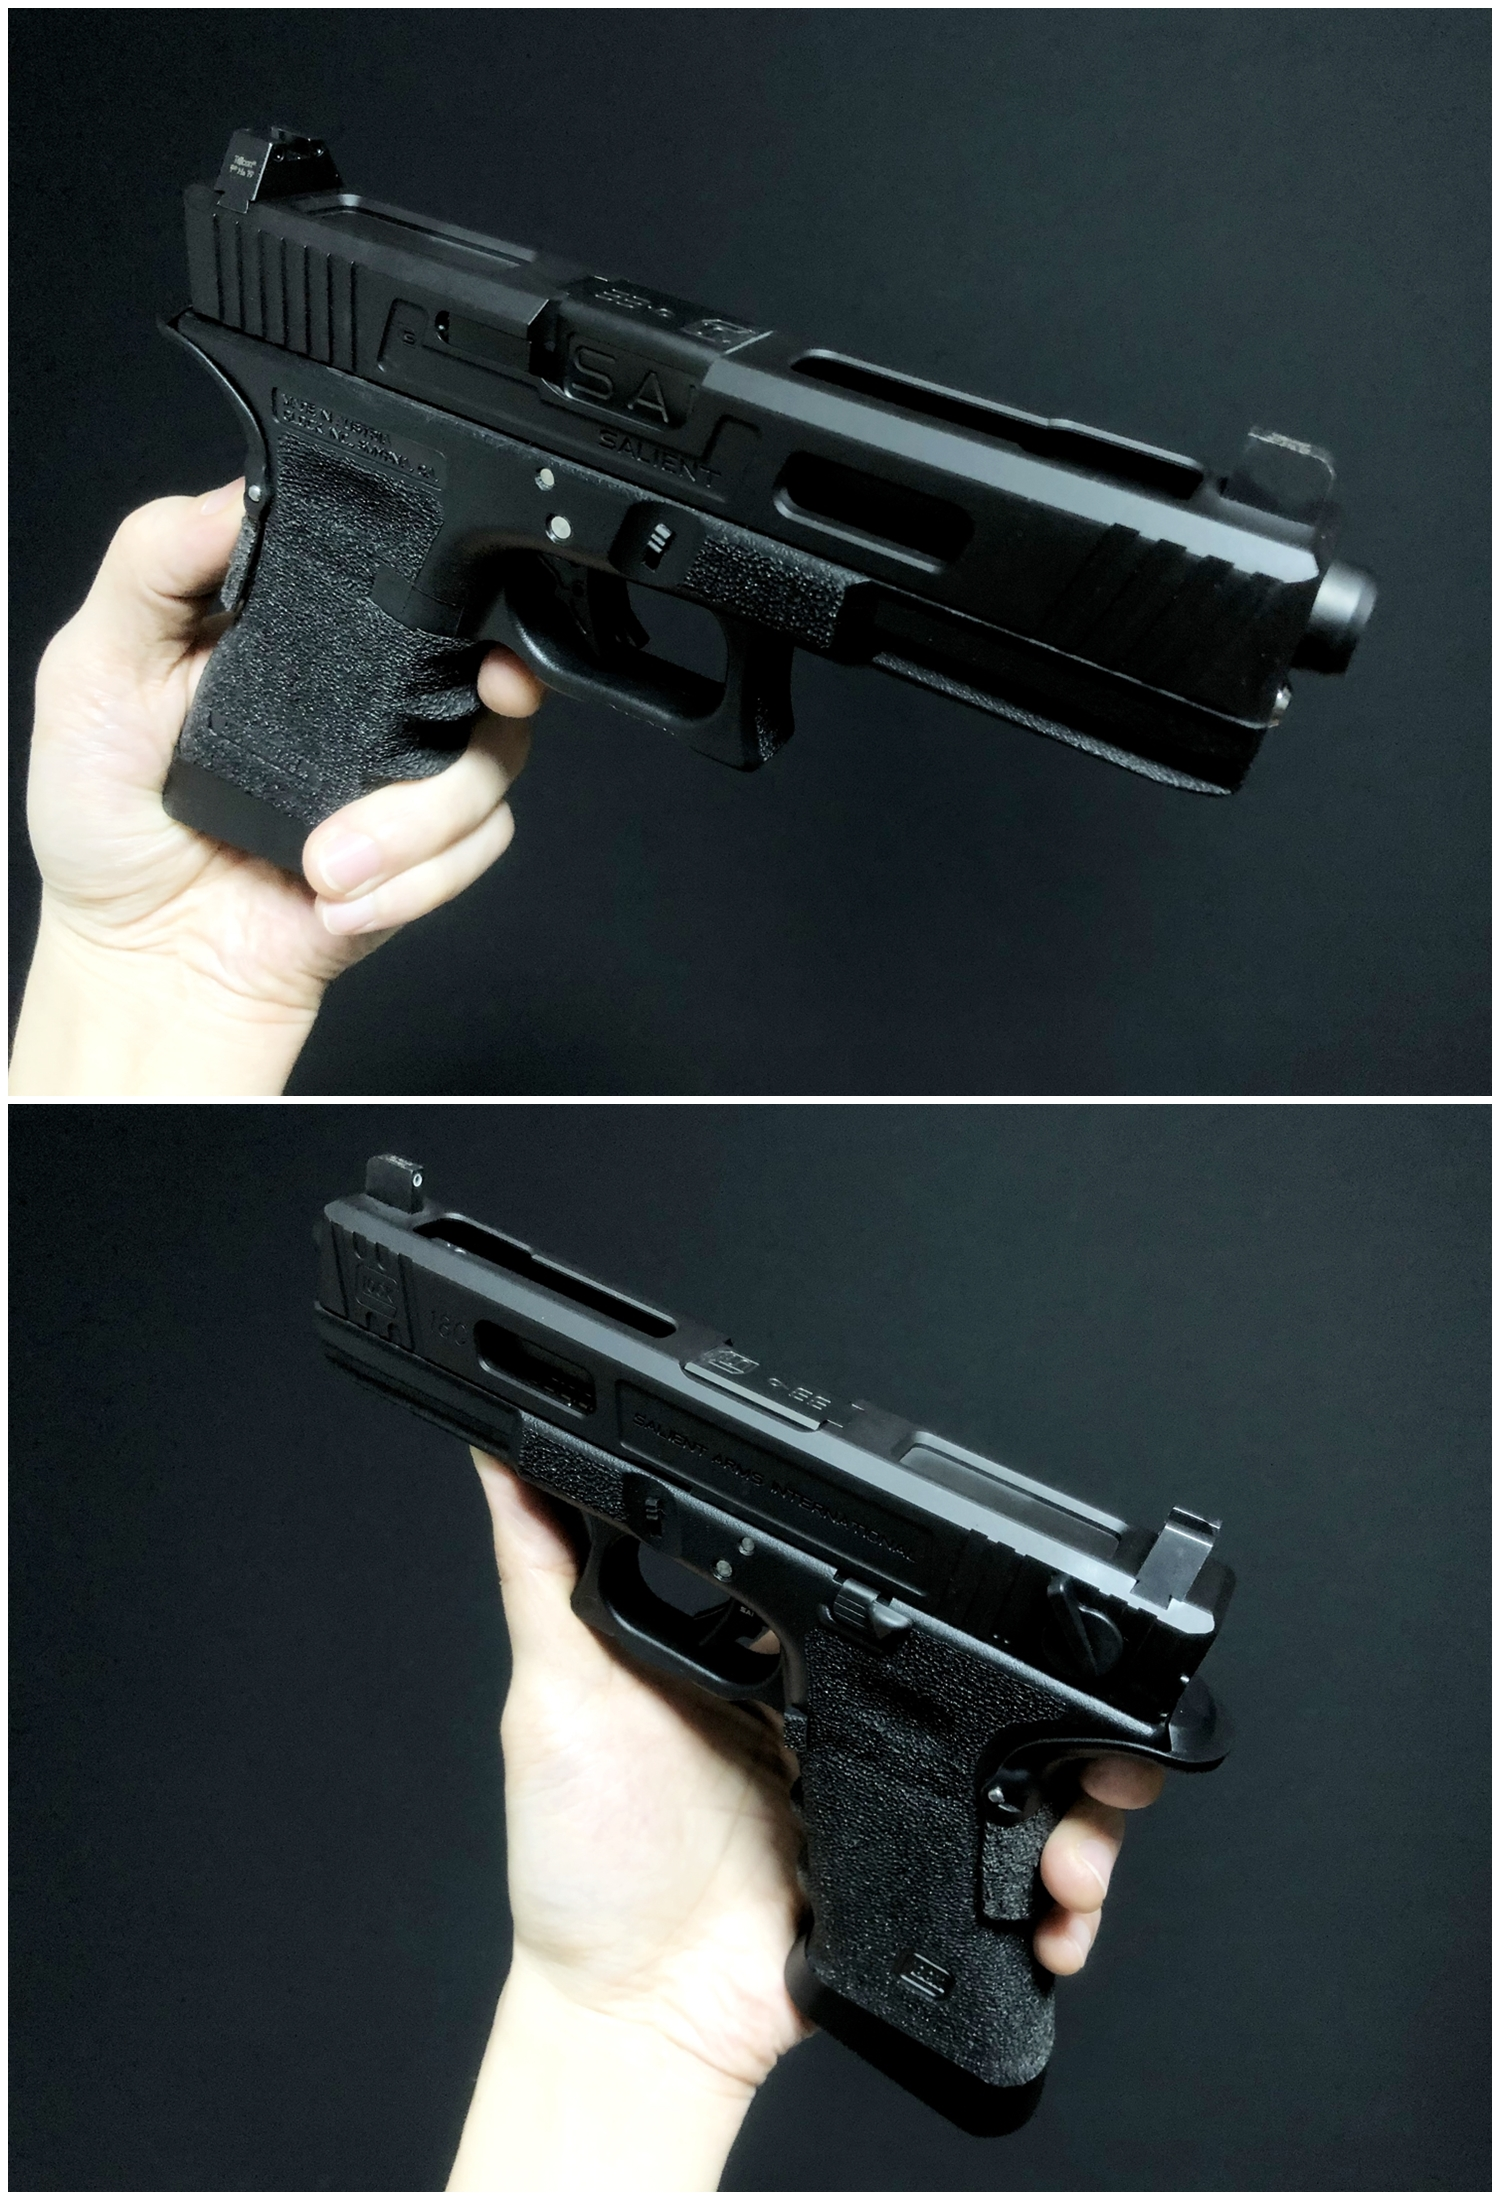 55 GLOCK Trijicon TRITIUM NIGHT SIGHTS HD HI LOW Guns Modify!! グロック トリジコン トリチウム サイト GET!! 購入 検証 取付 レビュー!! したるの巻!!